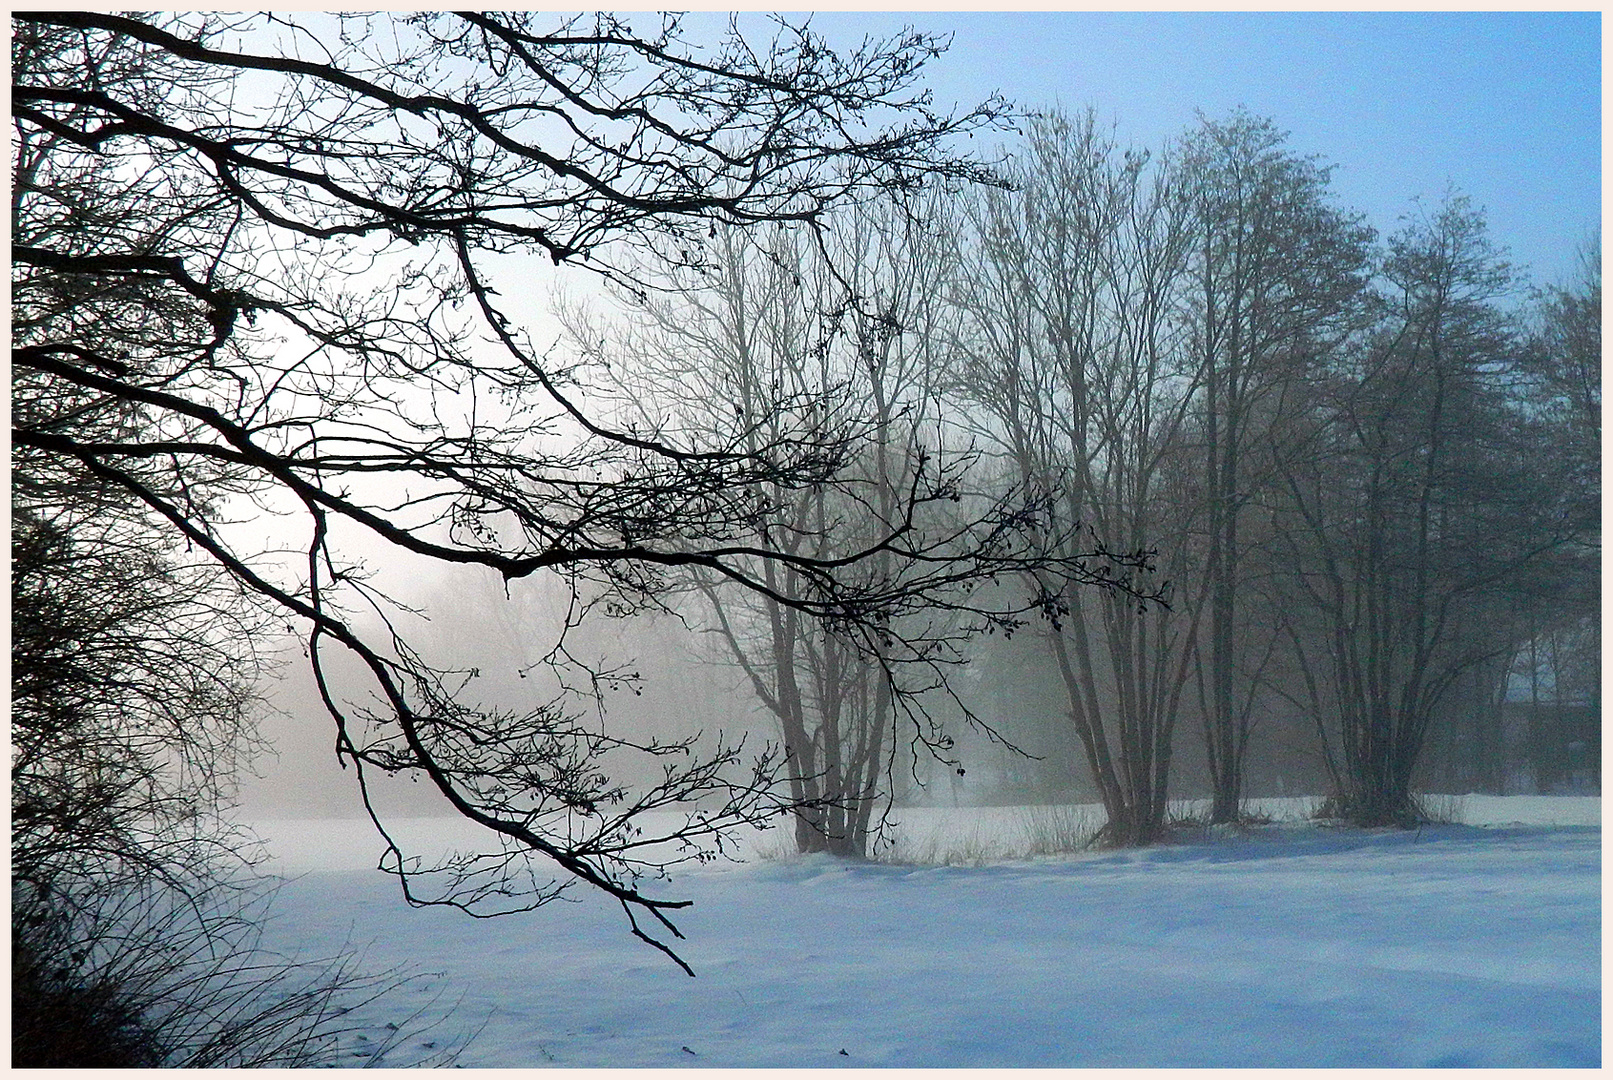 Winters letzter Zauberversuch